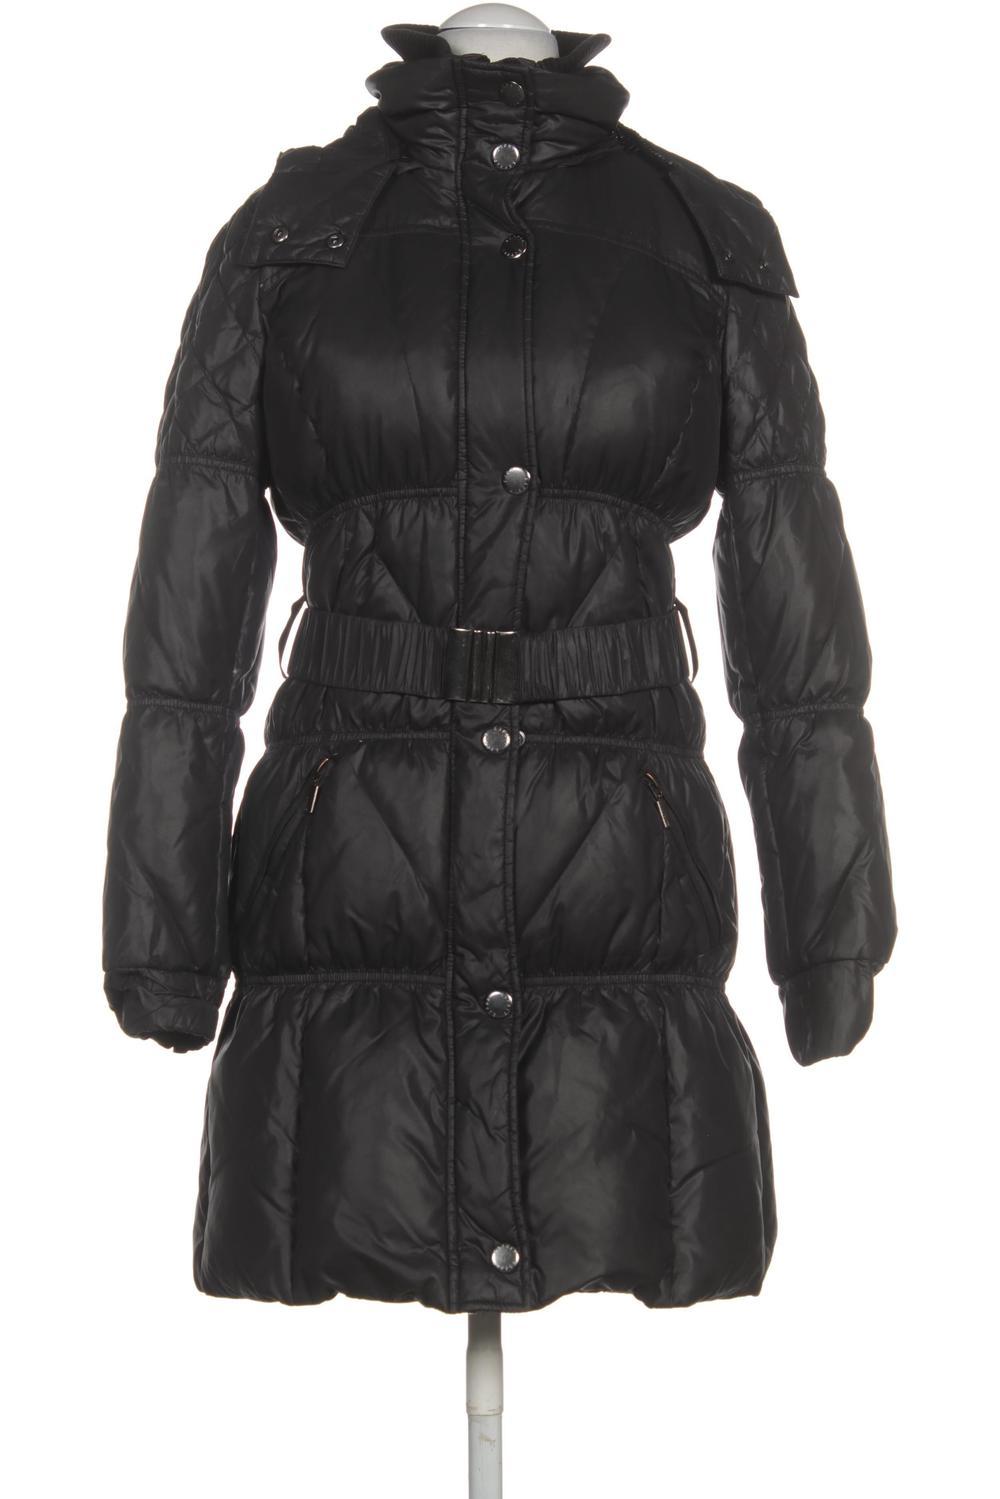 Esprit Mantel Damen Jacke Parka Gr. DE 36 grau #f738403 | eBay